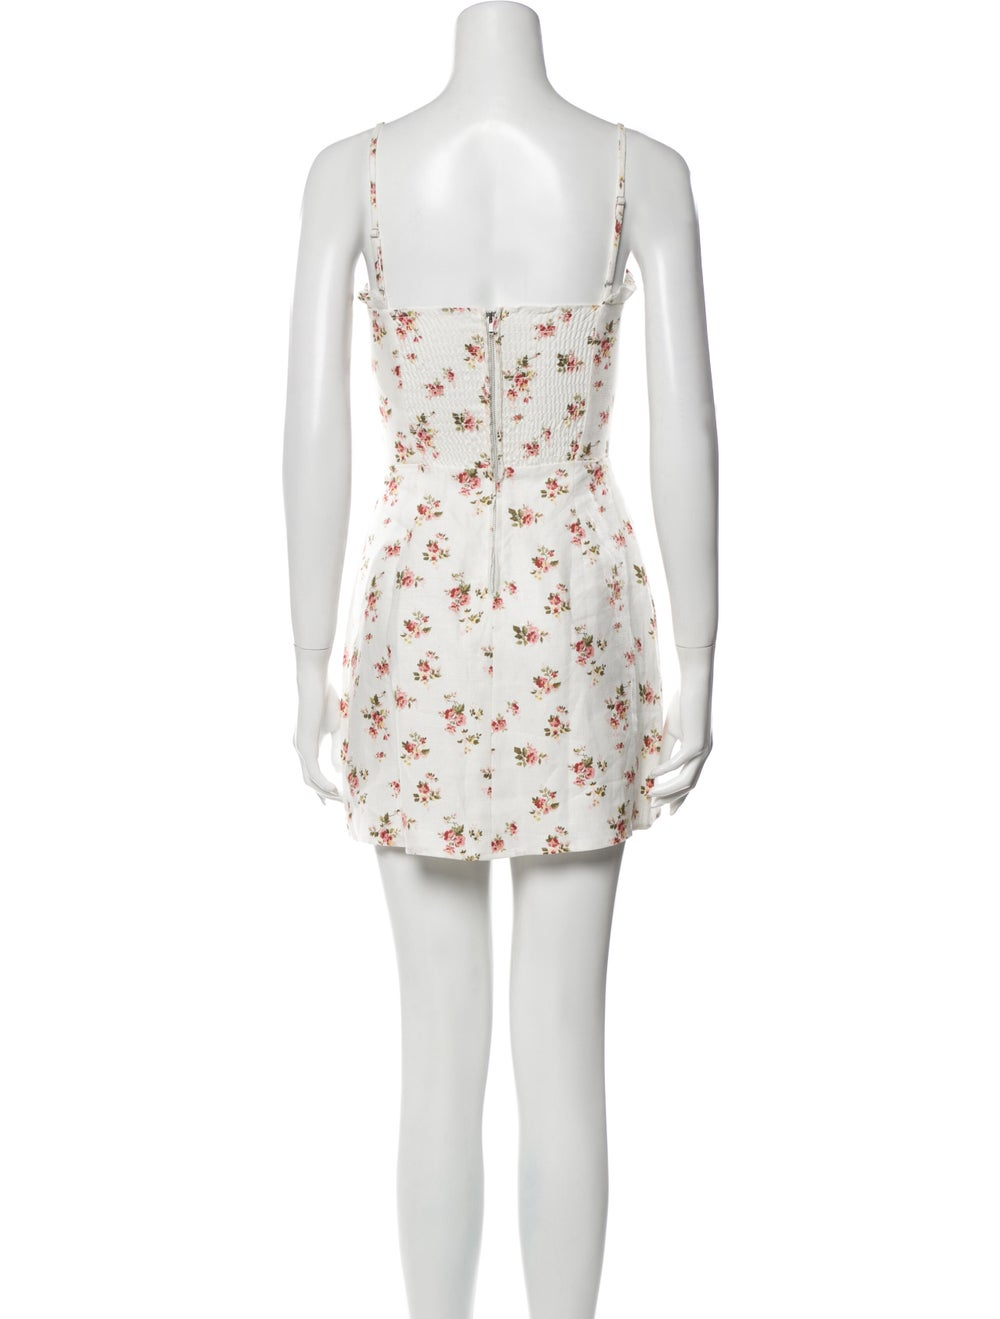 Reformation Linen Mini Dress White - image 3